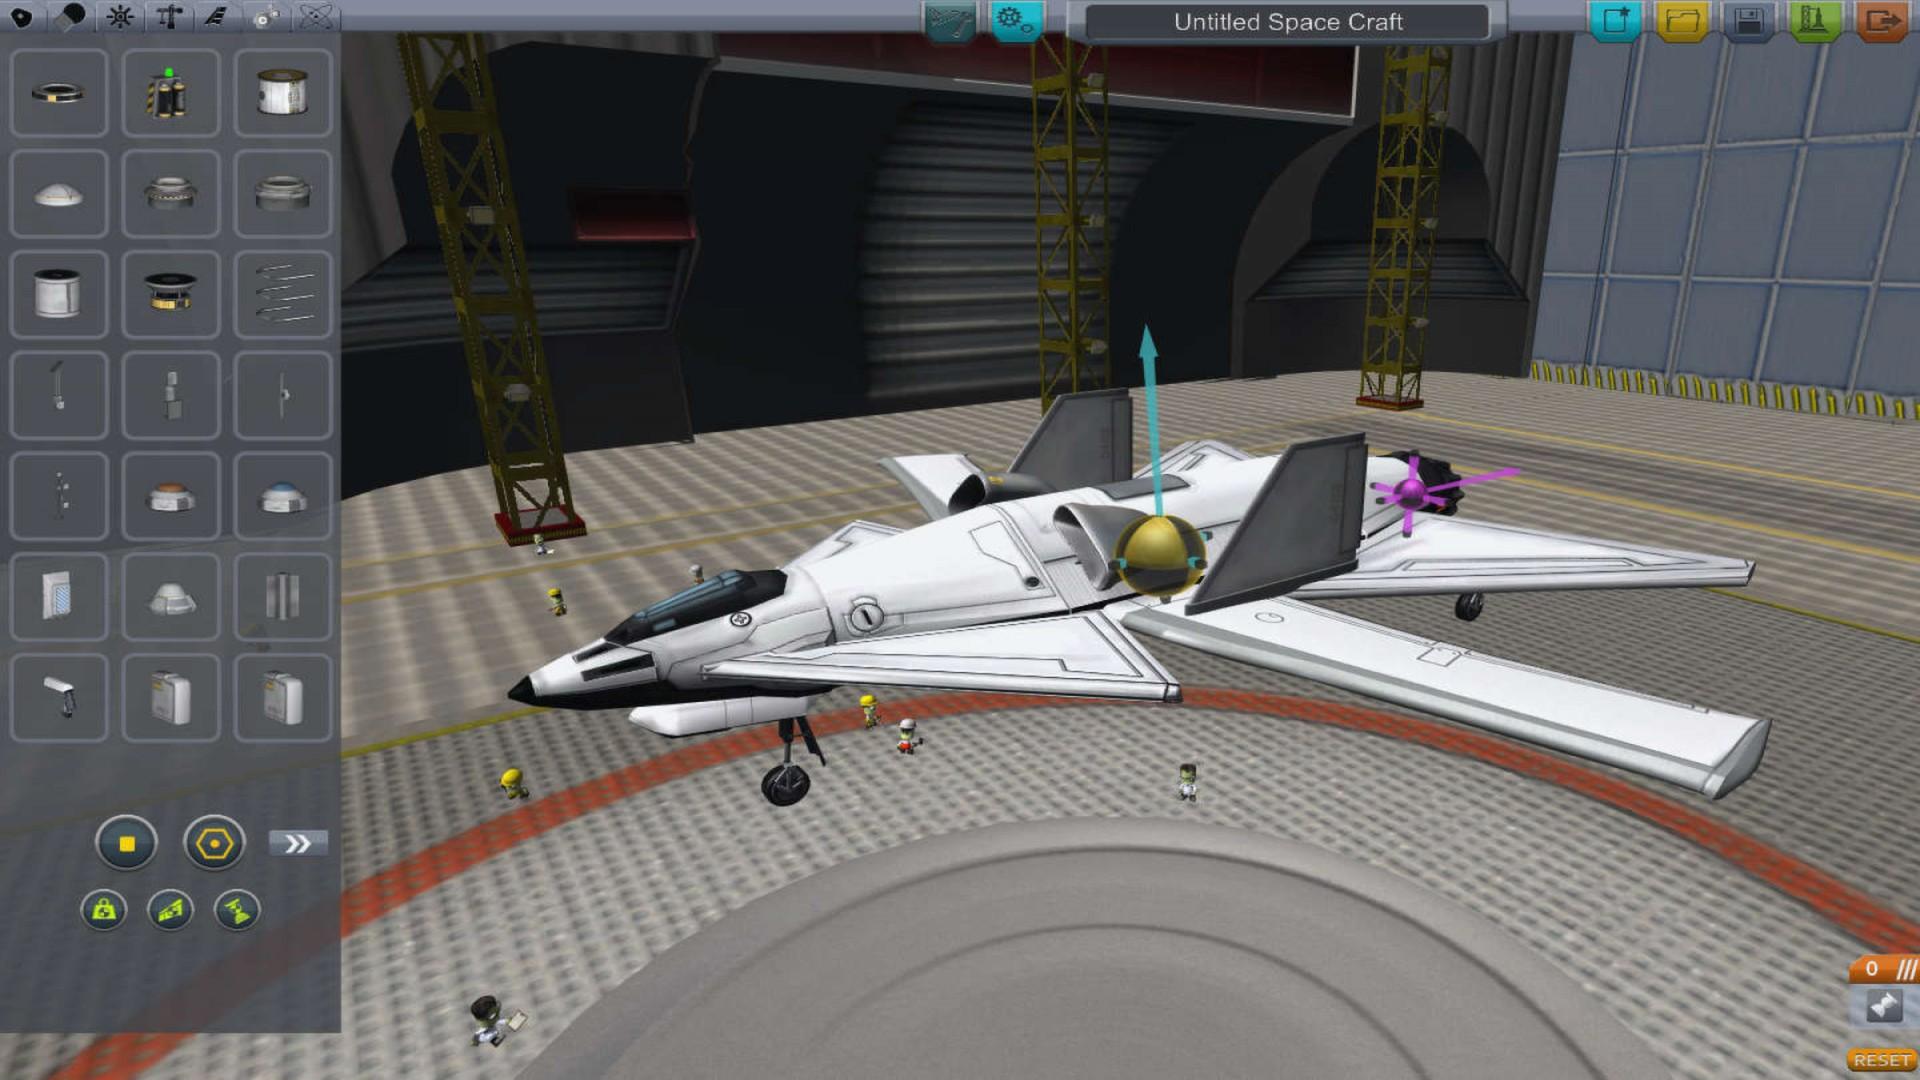 kerbal space program gift code - photo #14